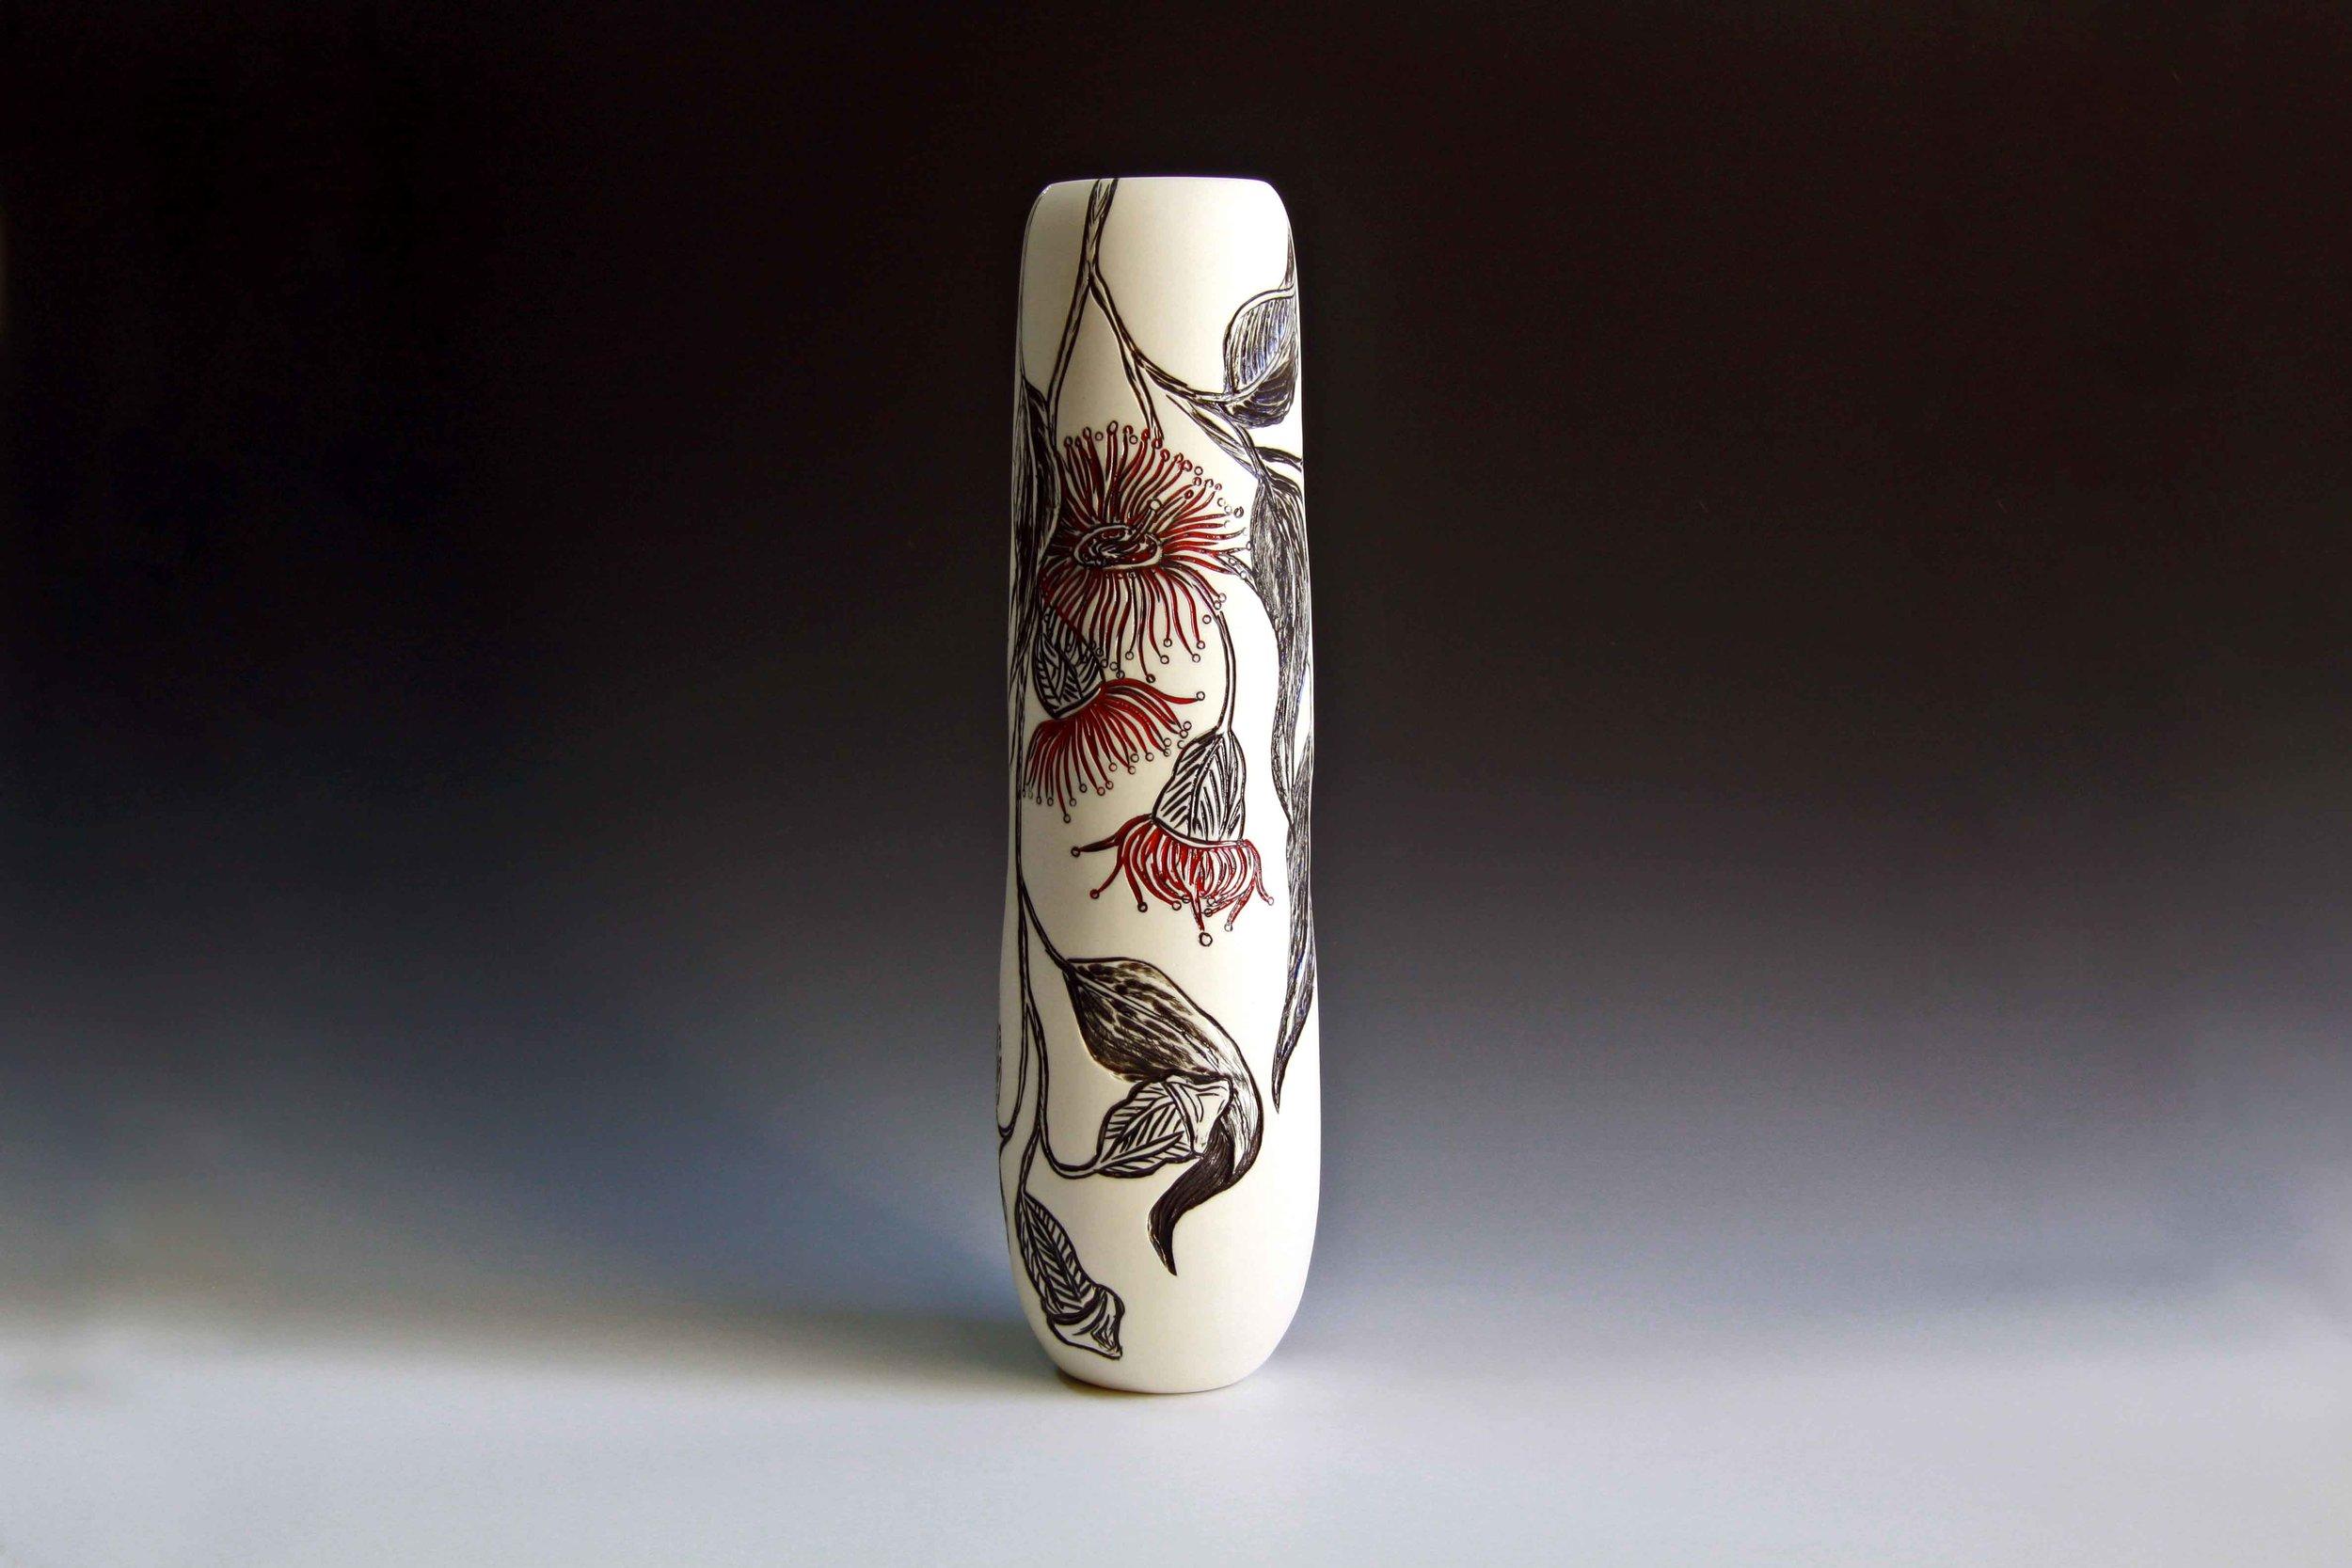 Tall_eucalyptus_vase.jpg